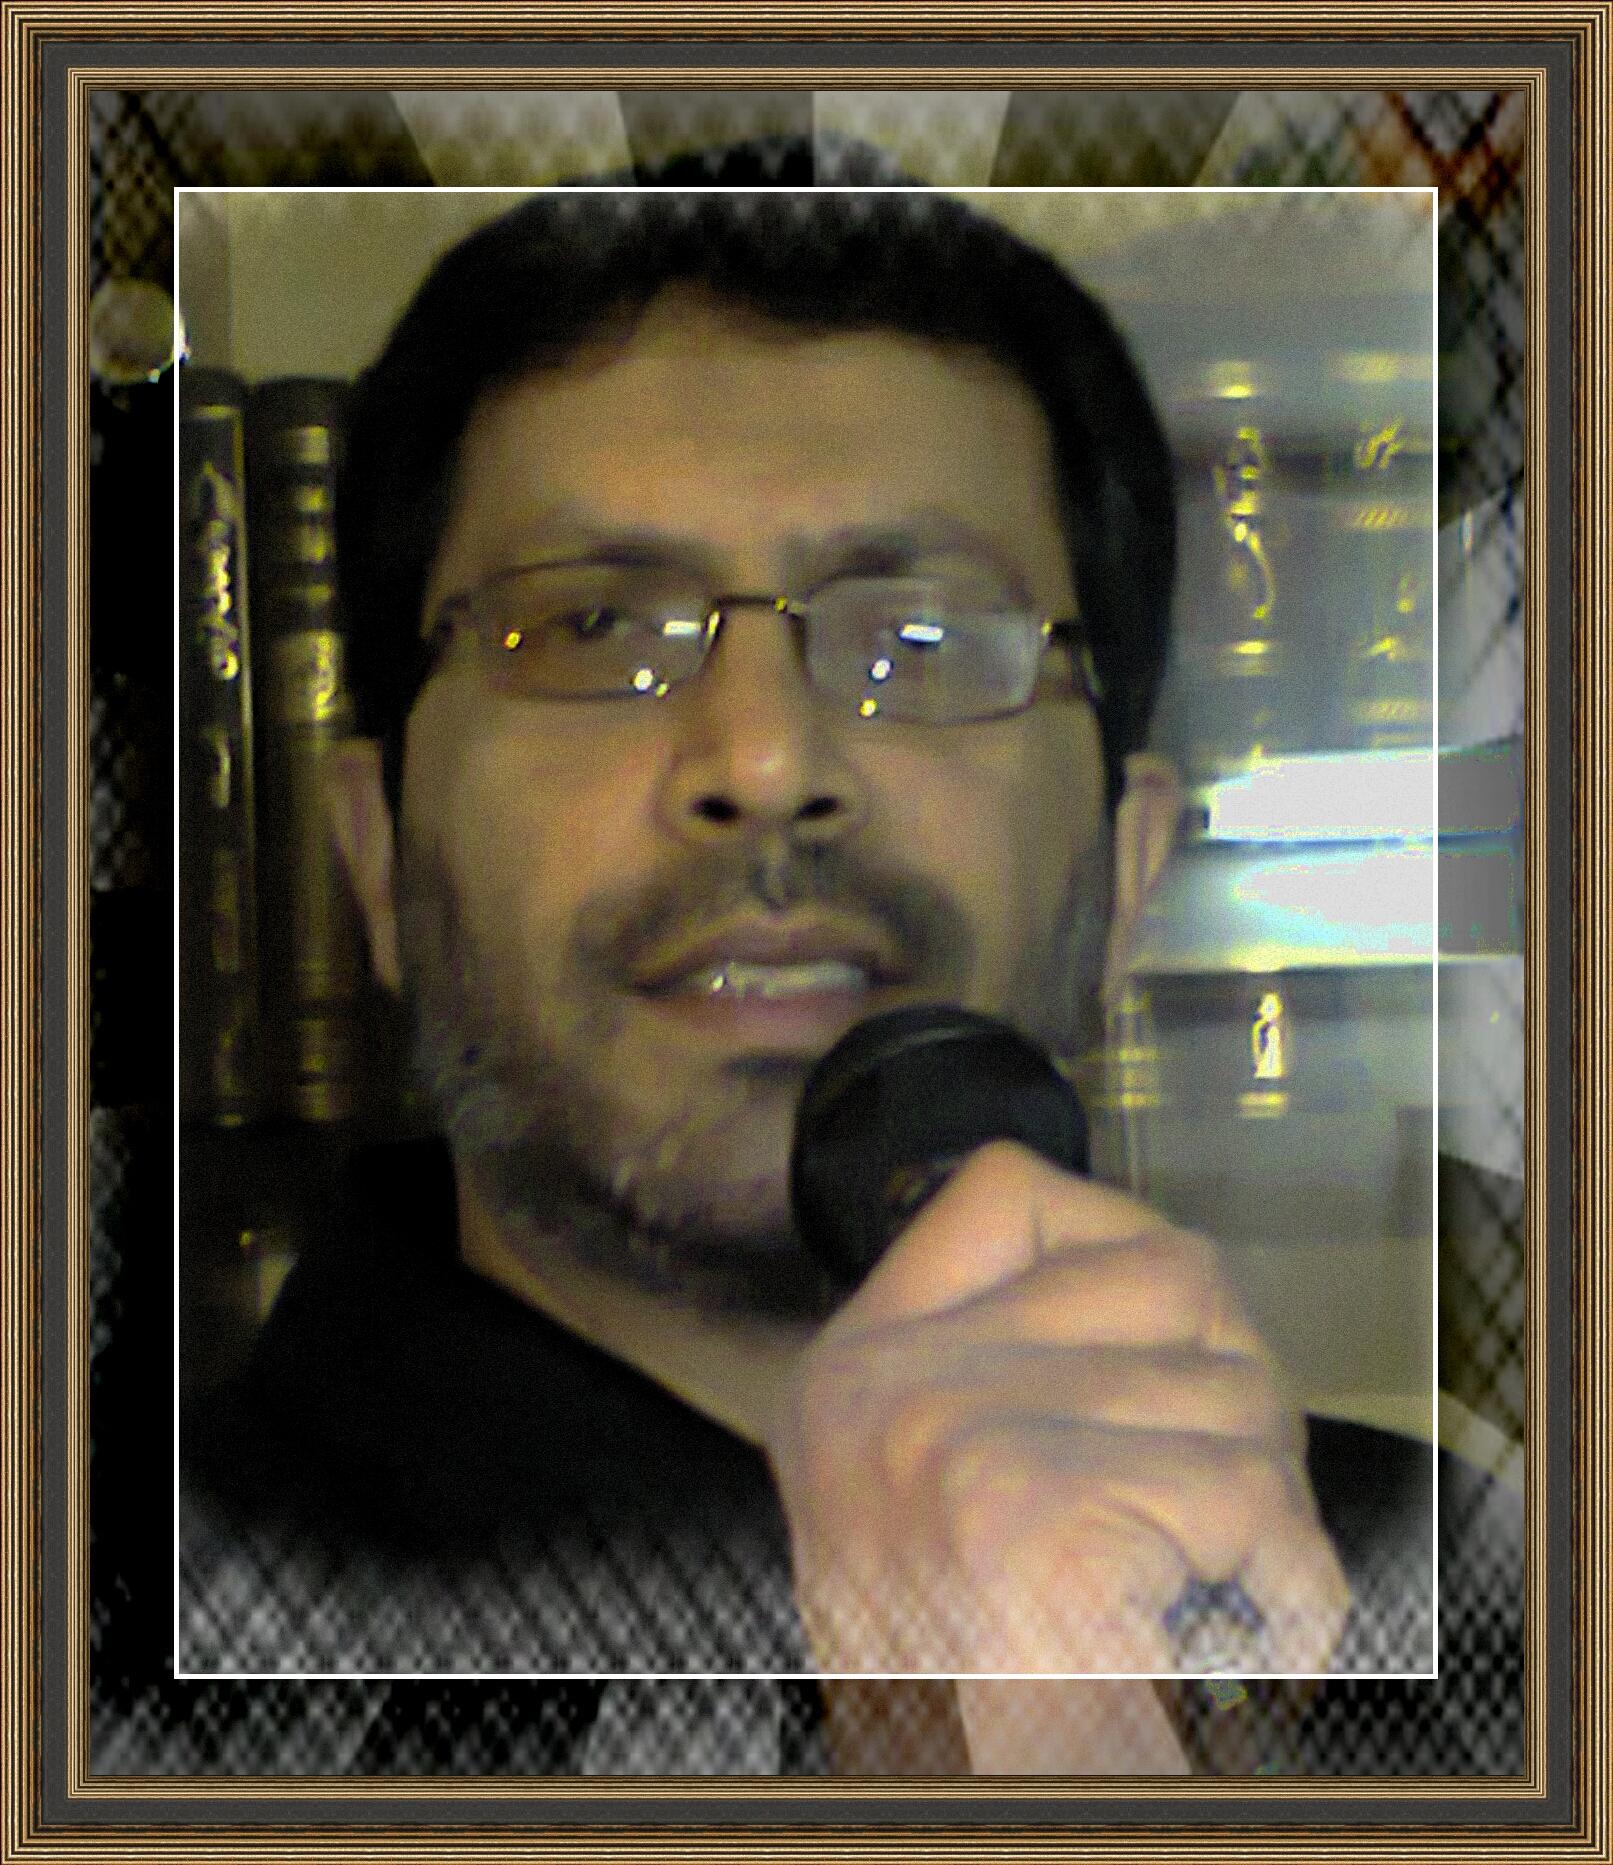 http://hazratfatemezahra348.persiangig.com/image/davood.salari - ../davood.salari - (3).jpg